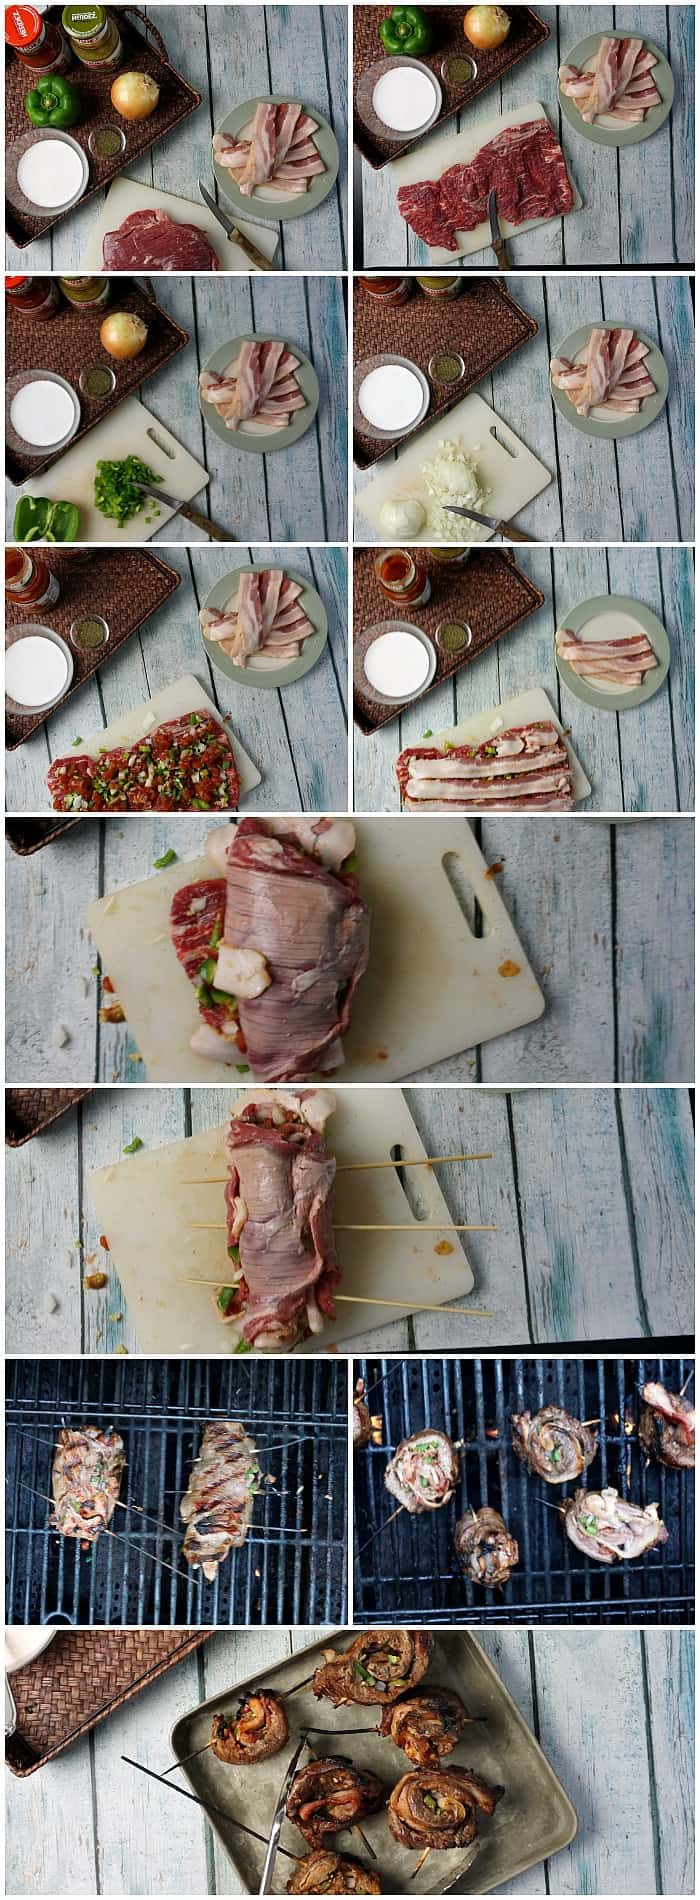 Tutorial for how to make a steak pinwheel recipe